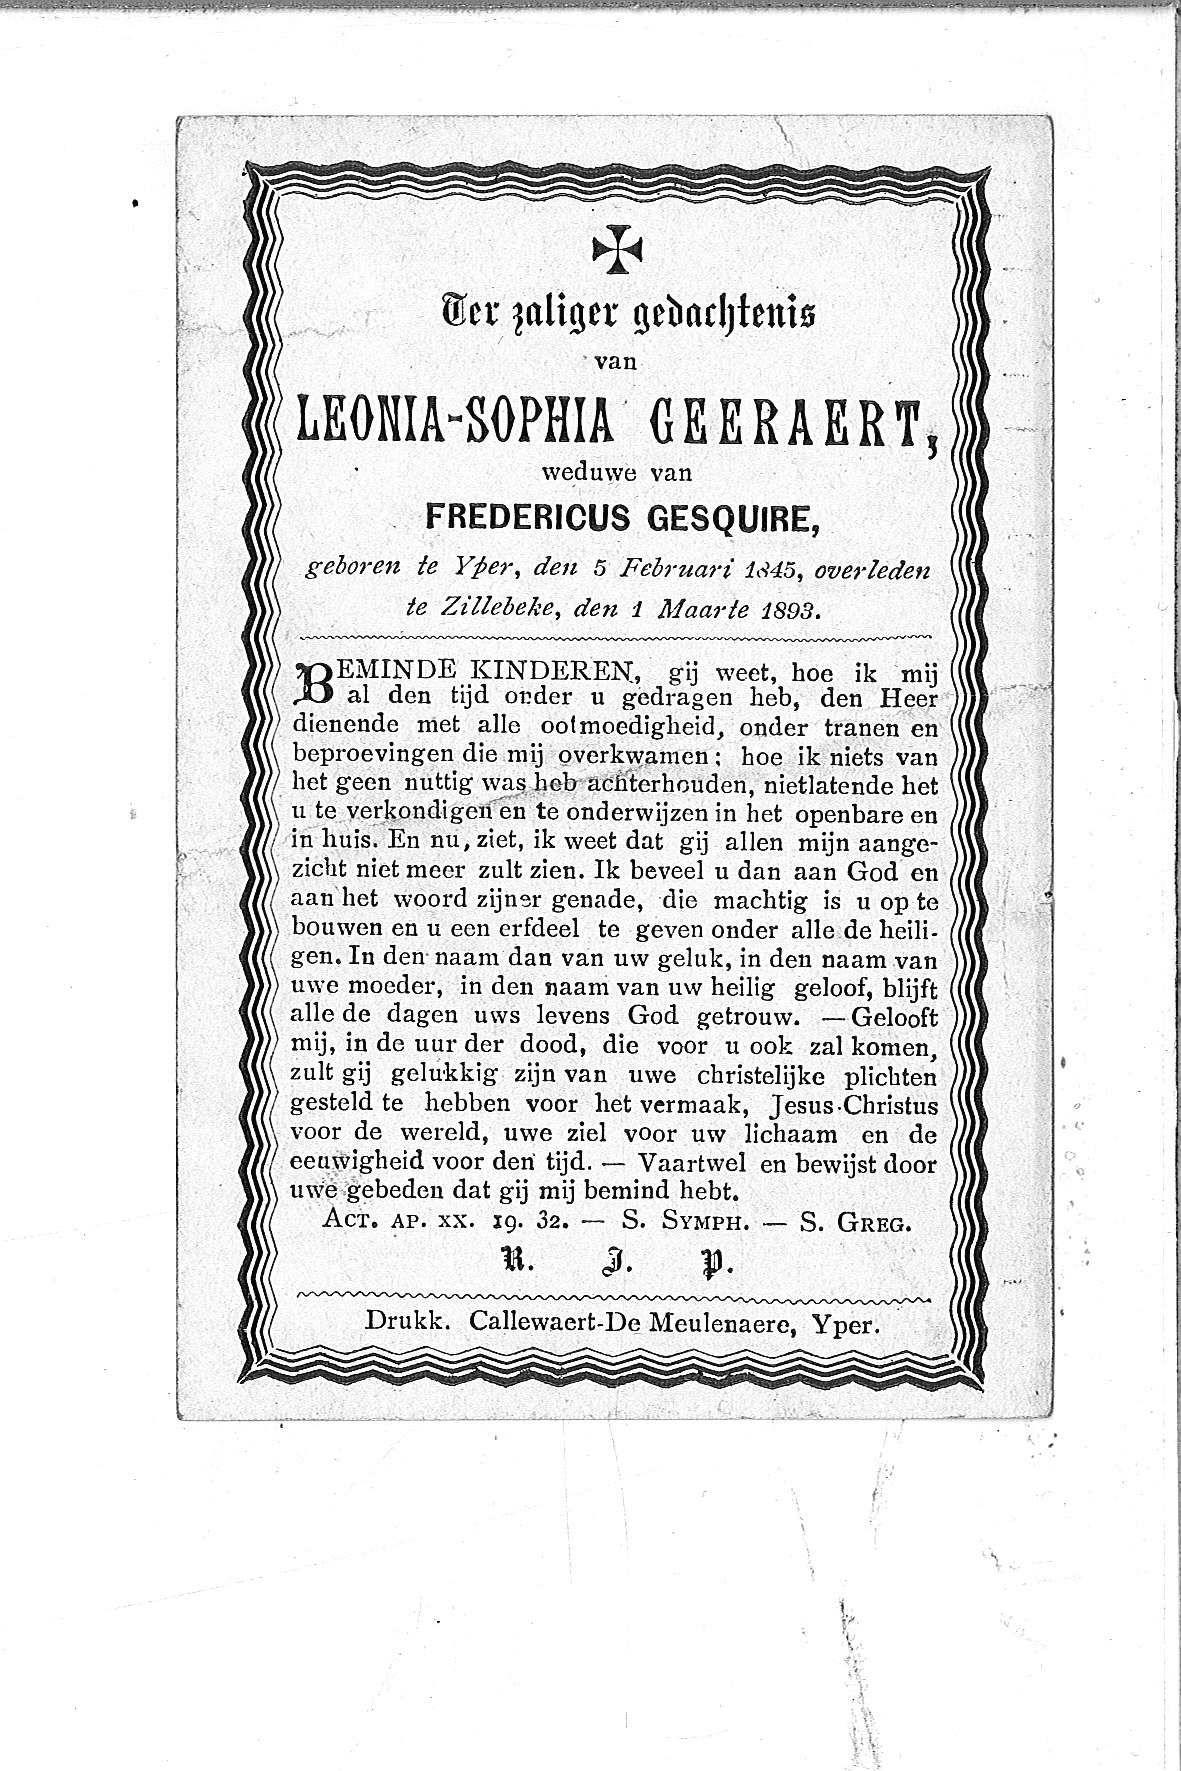 Leonia-Sophia(1893)20130821155154_00014.jpg